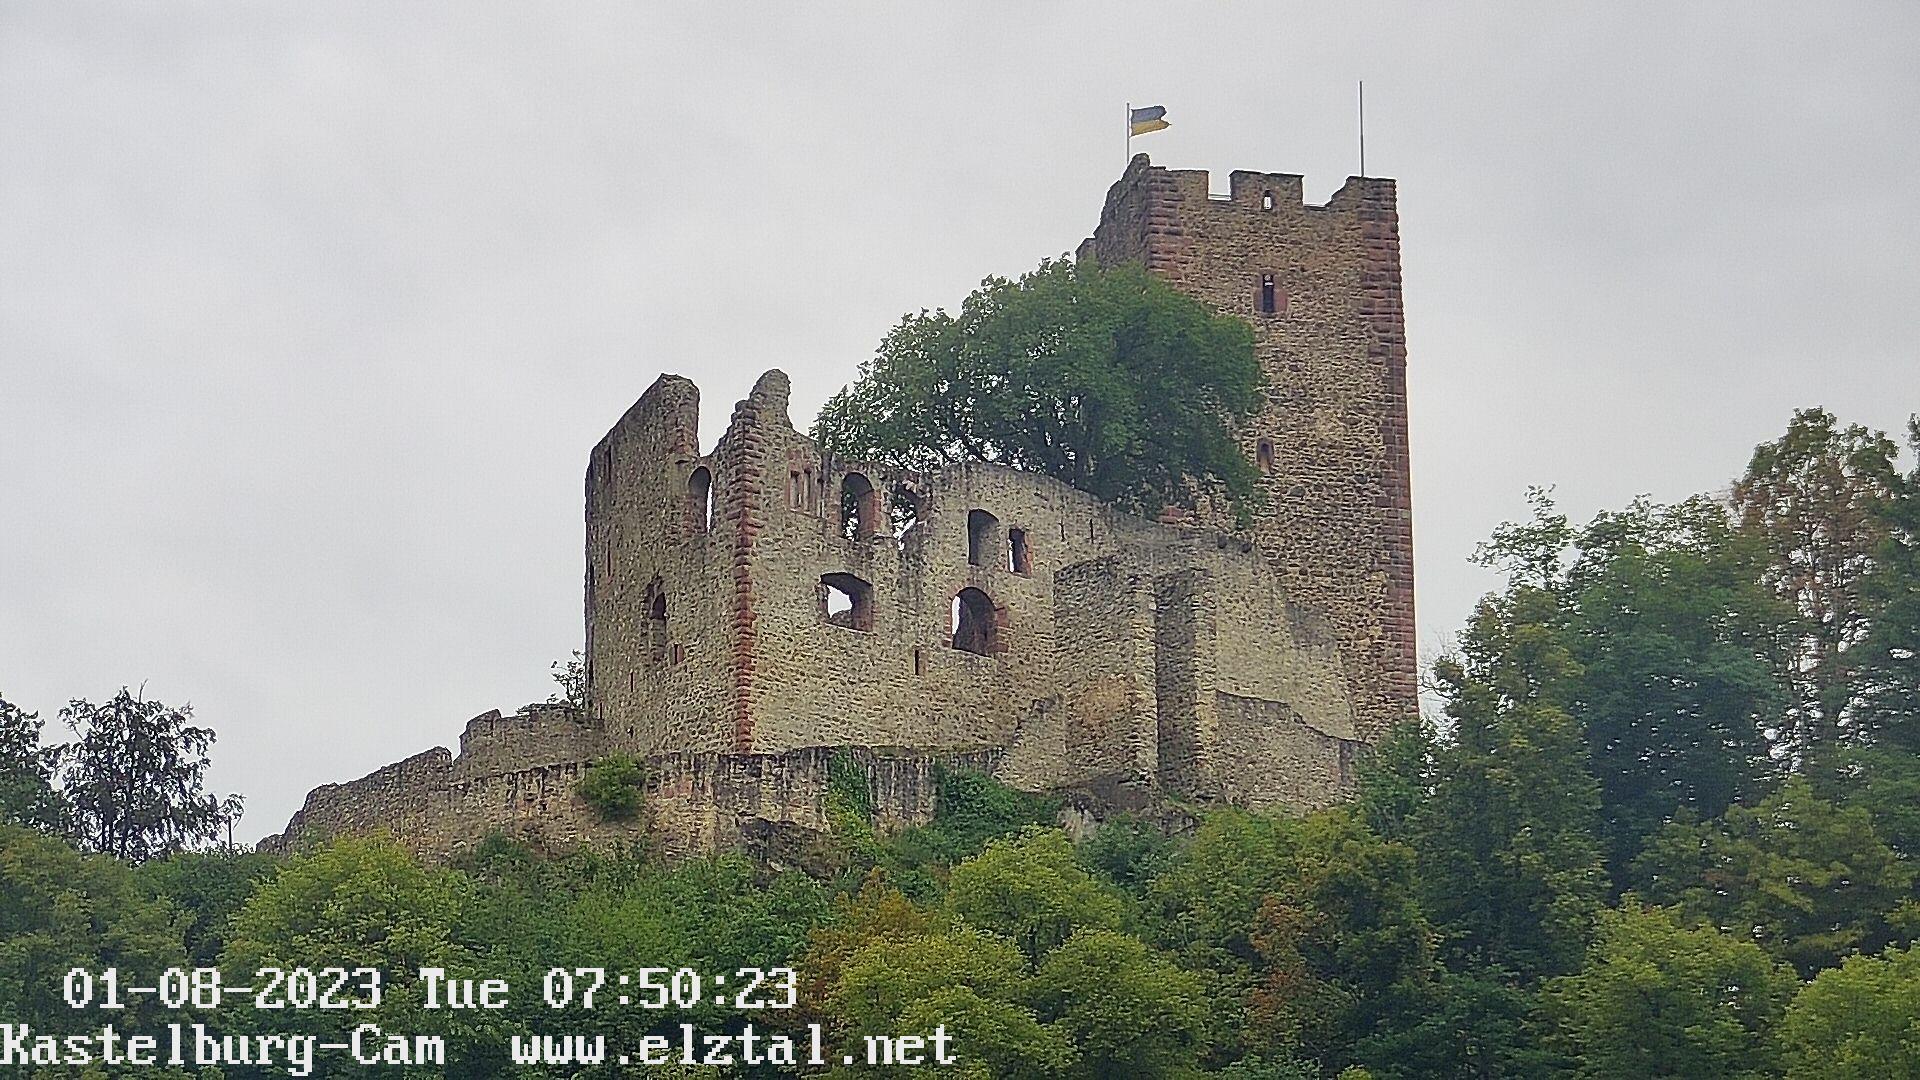 Waldkirch Wed. 07:55